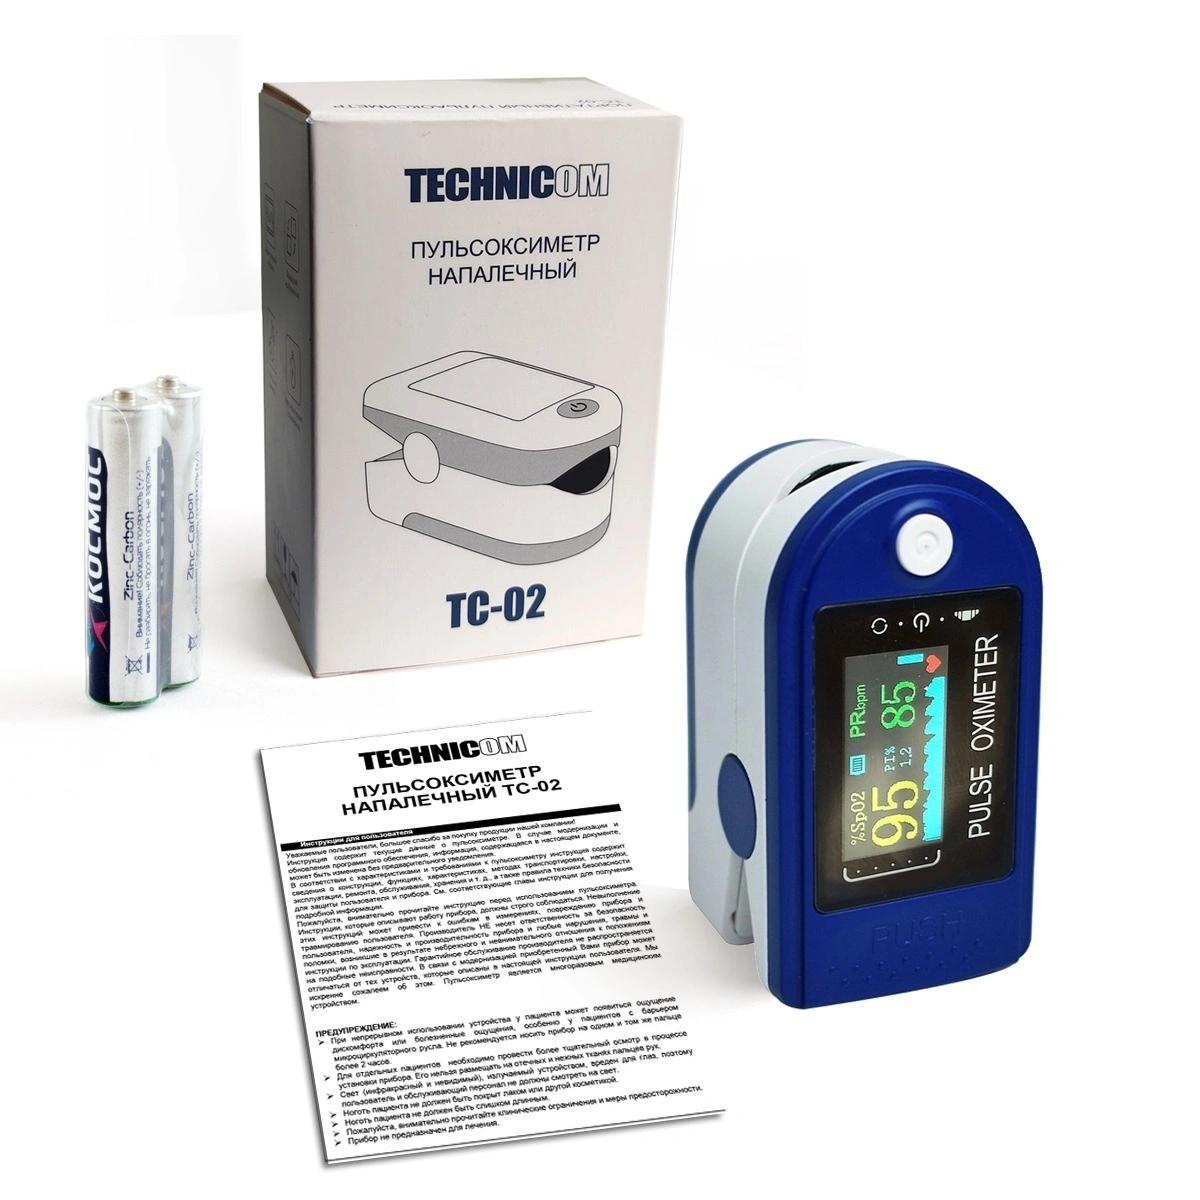 Пульсоксиметр напалечный Technicom TC 02